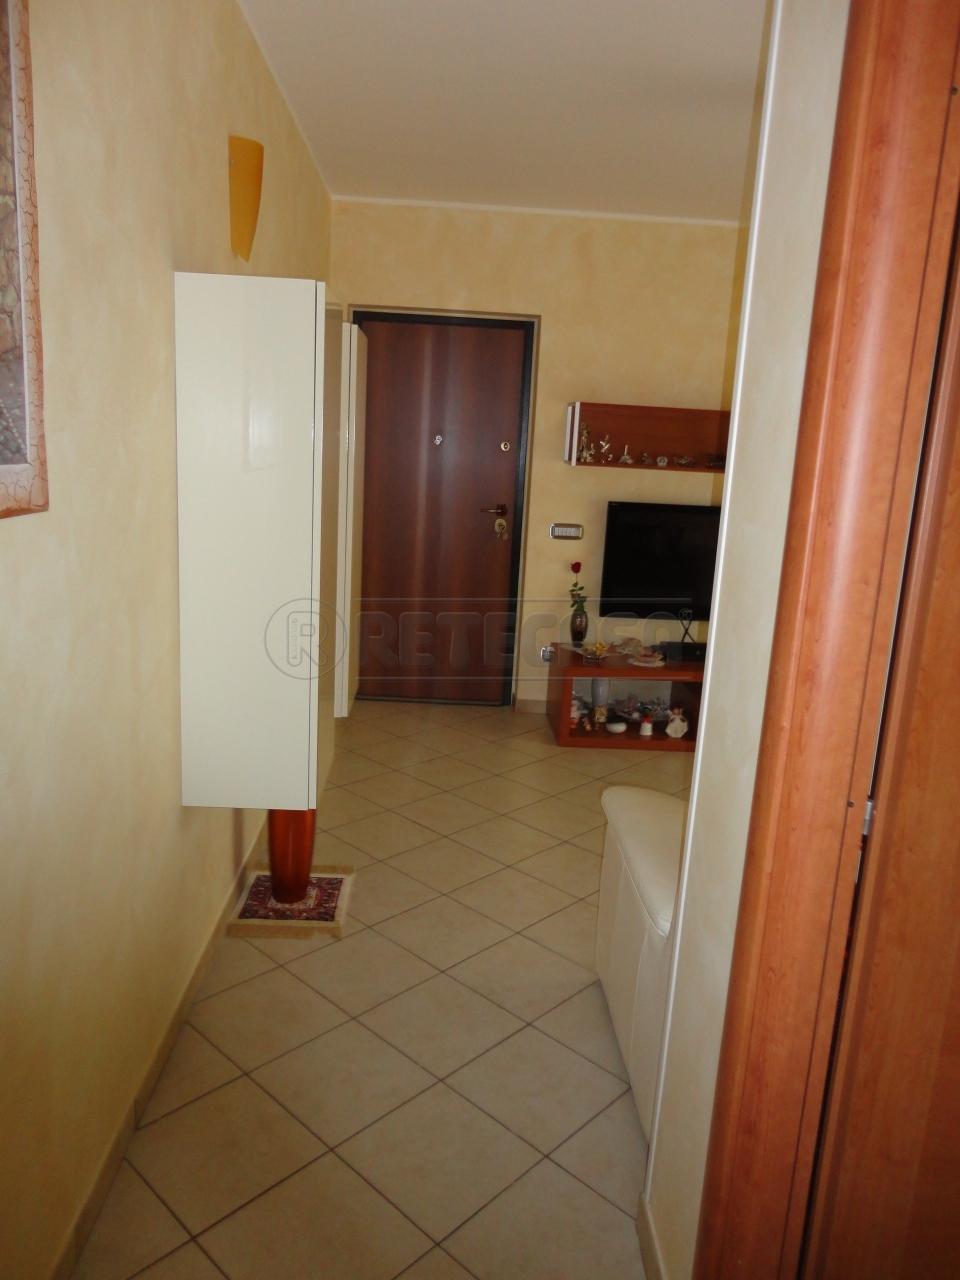 Trilocale in vendita a Catanzaro in Via Friuli